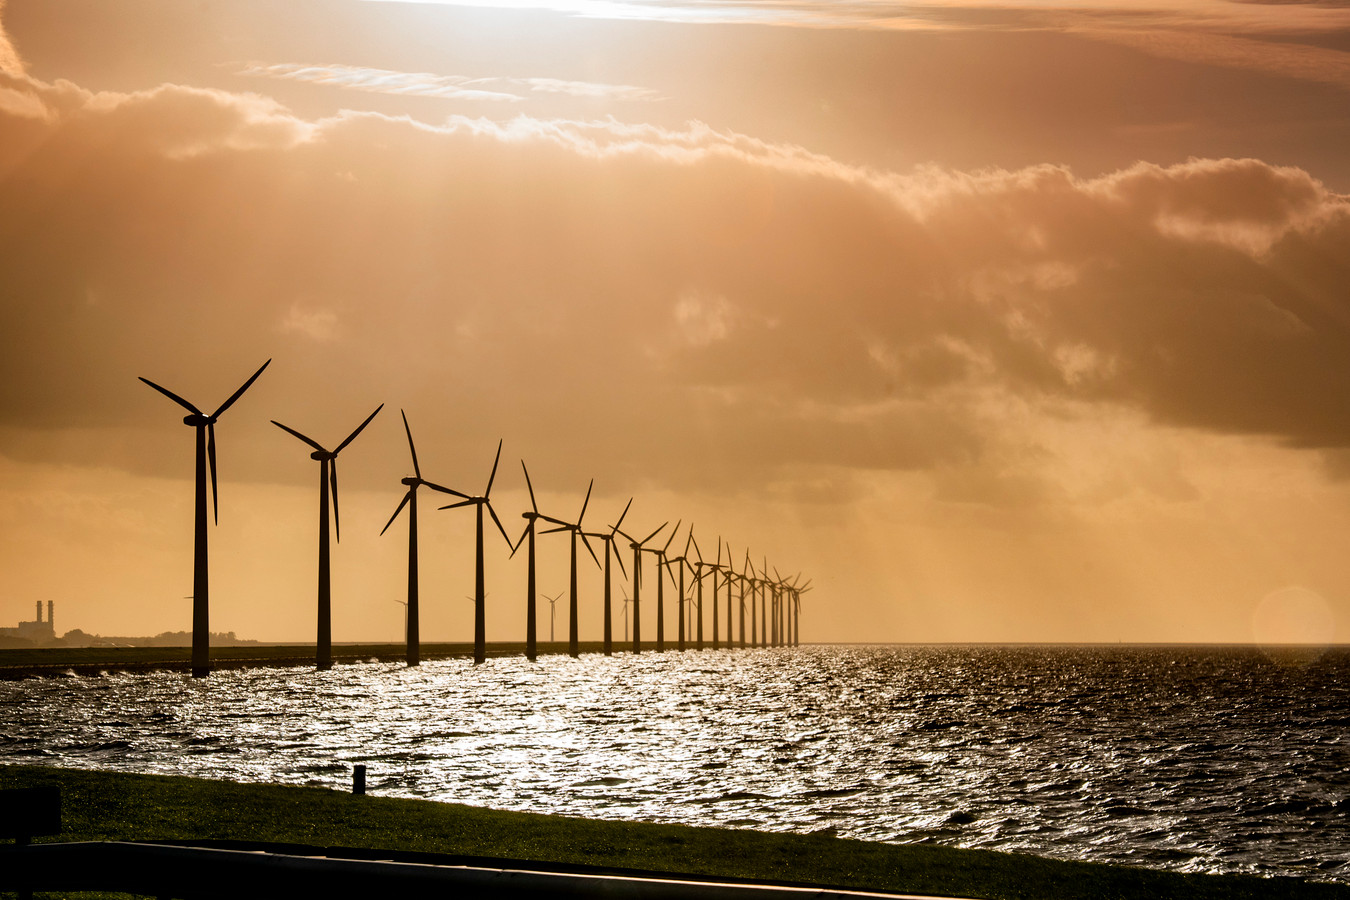 Windmolens in de Flevopolder.